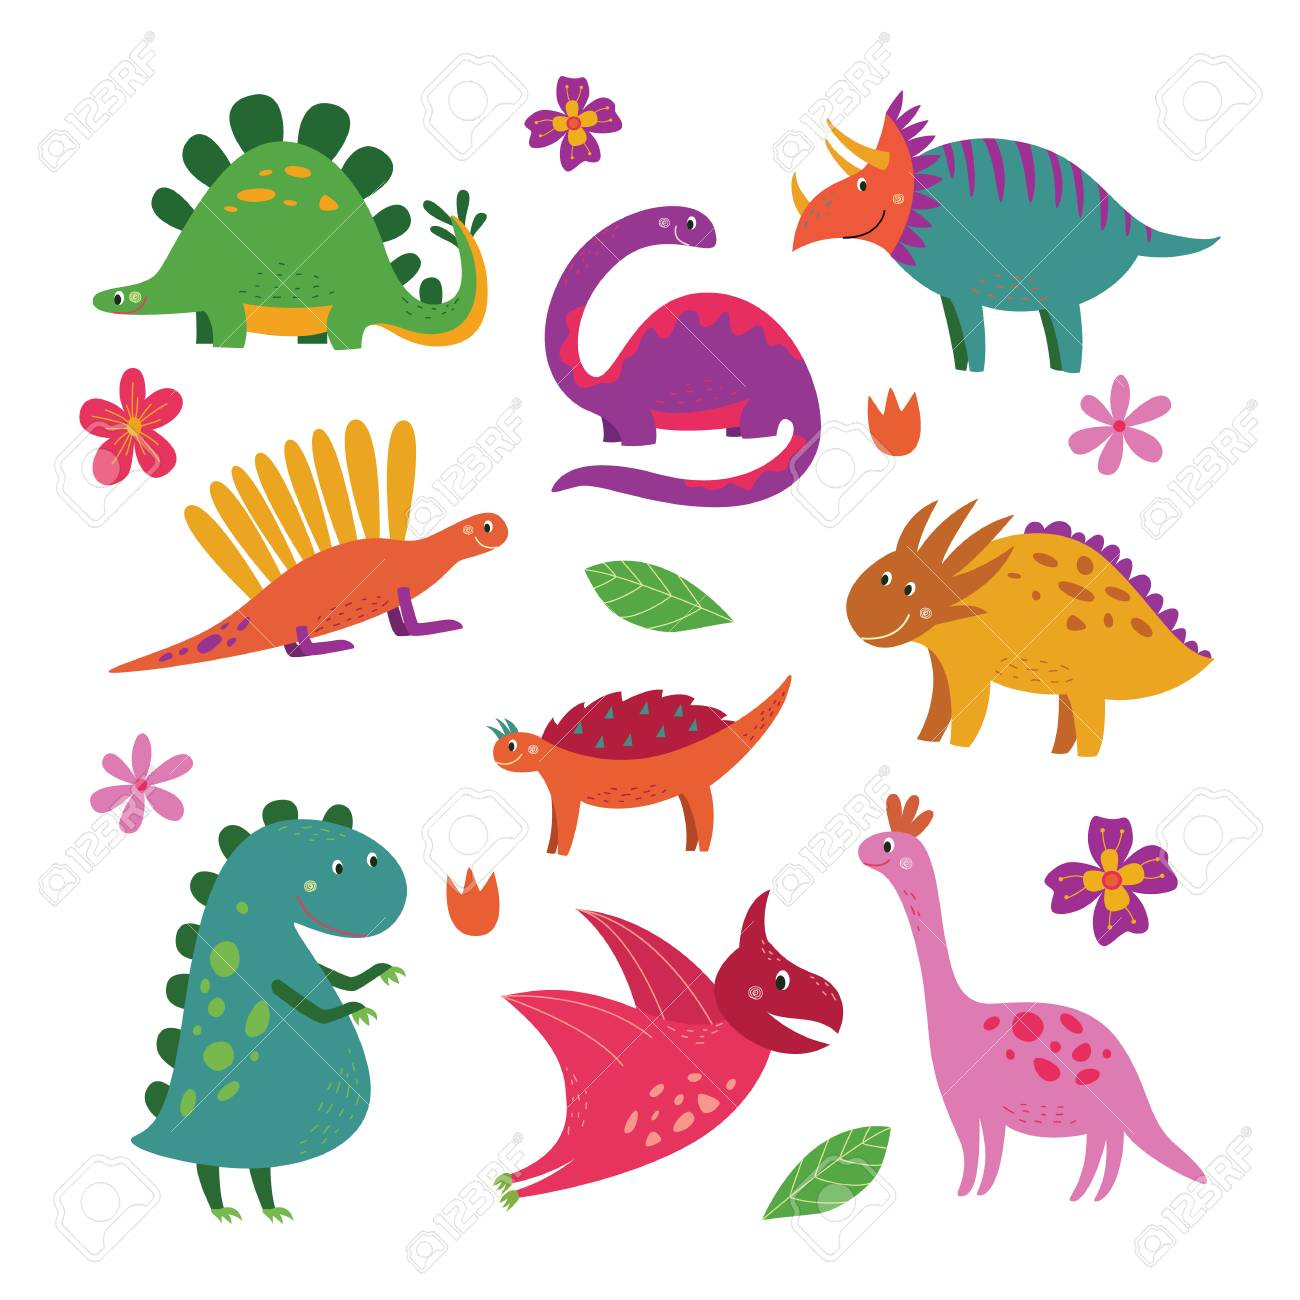 Cute dinosaur collection